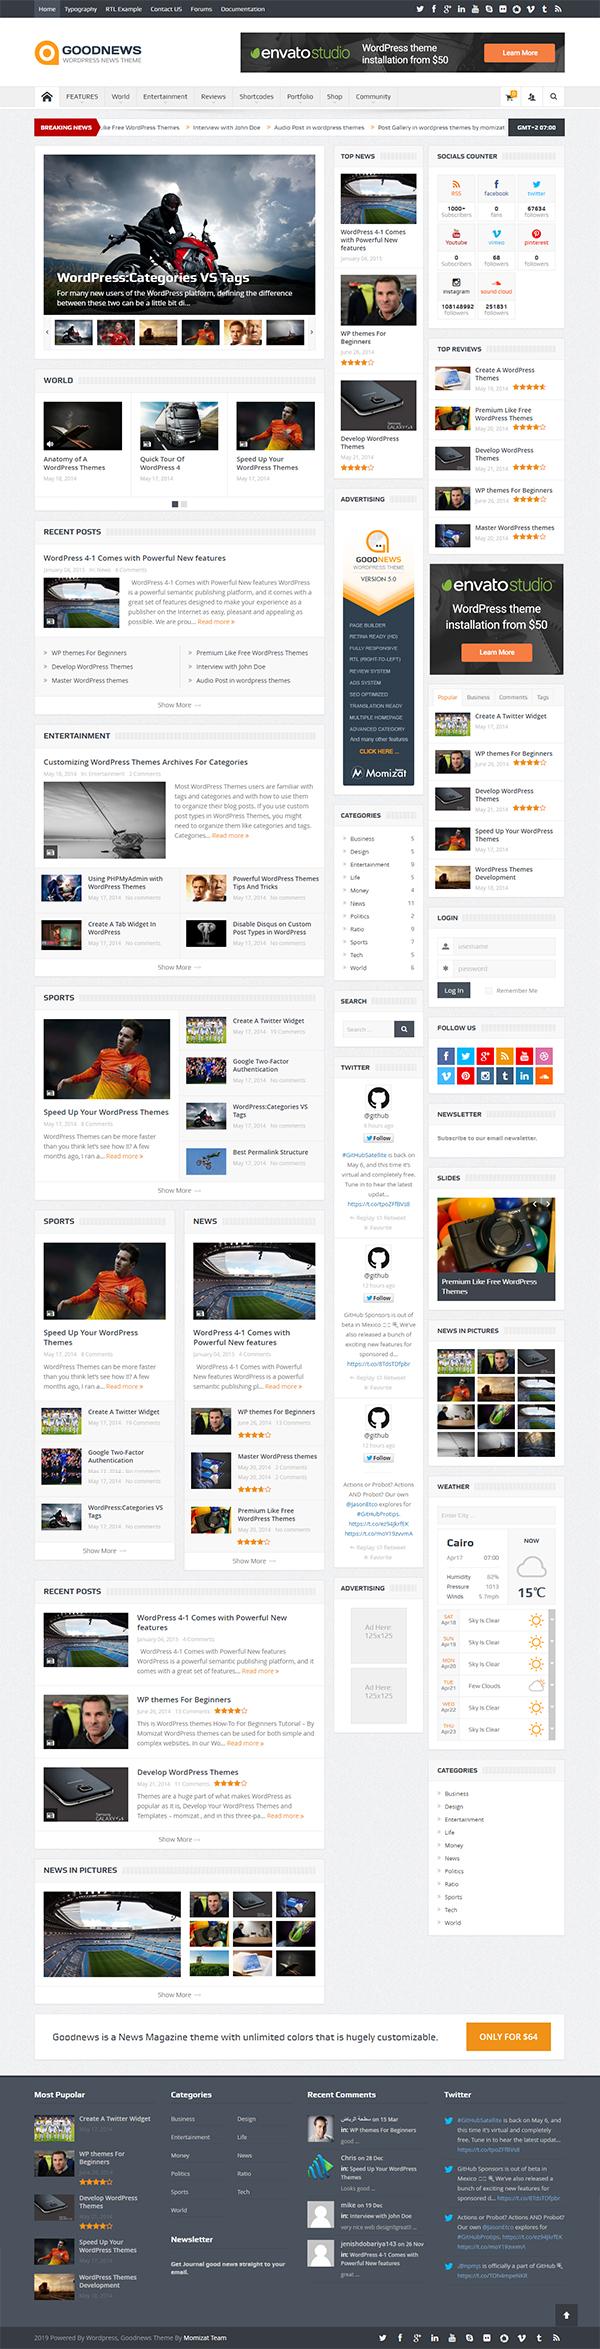 Goodnews – Responsive WordPress News / Magazine